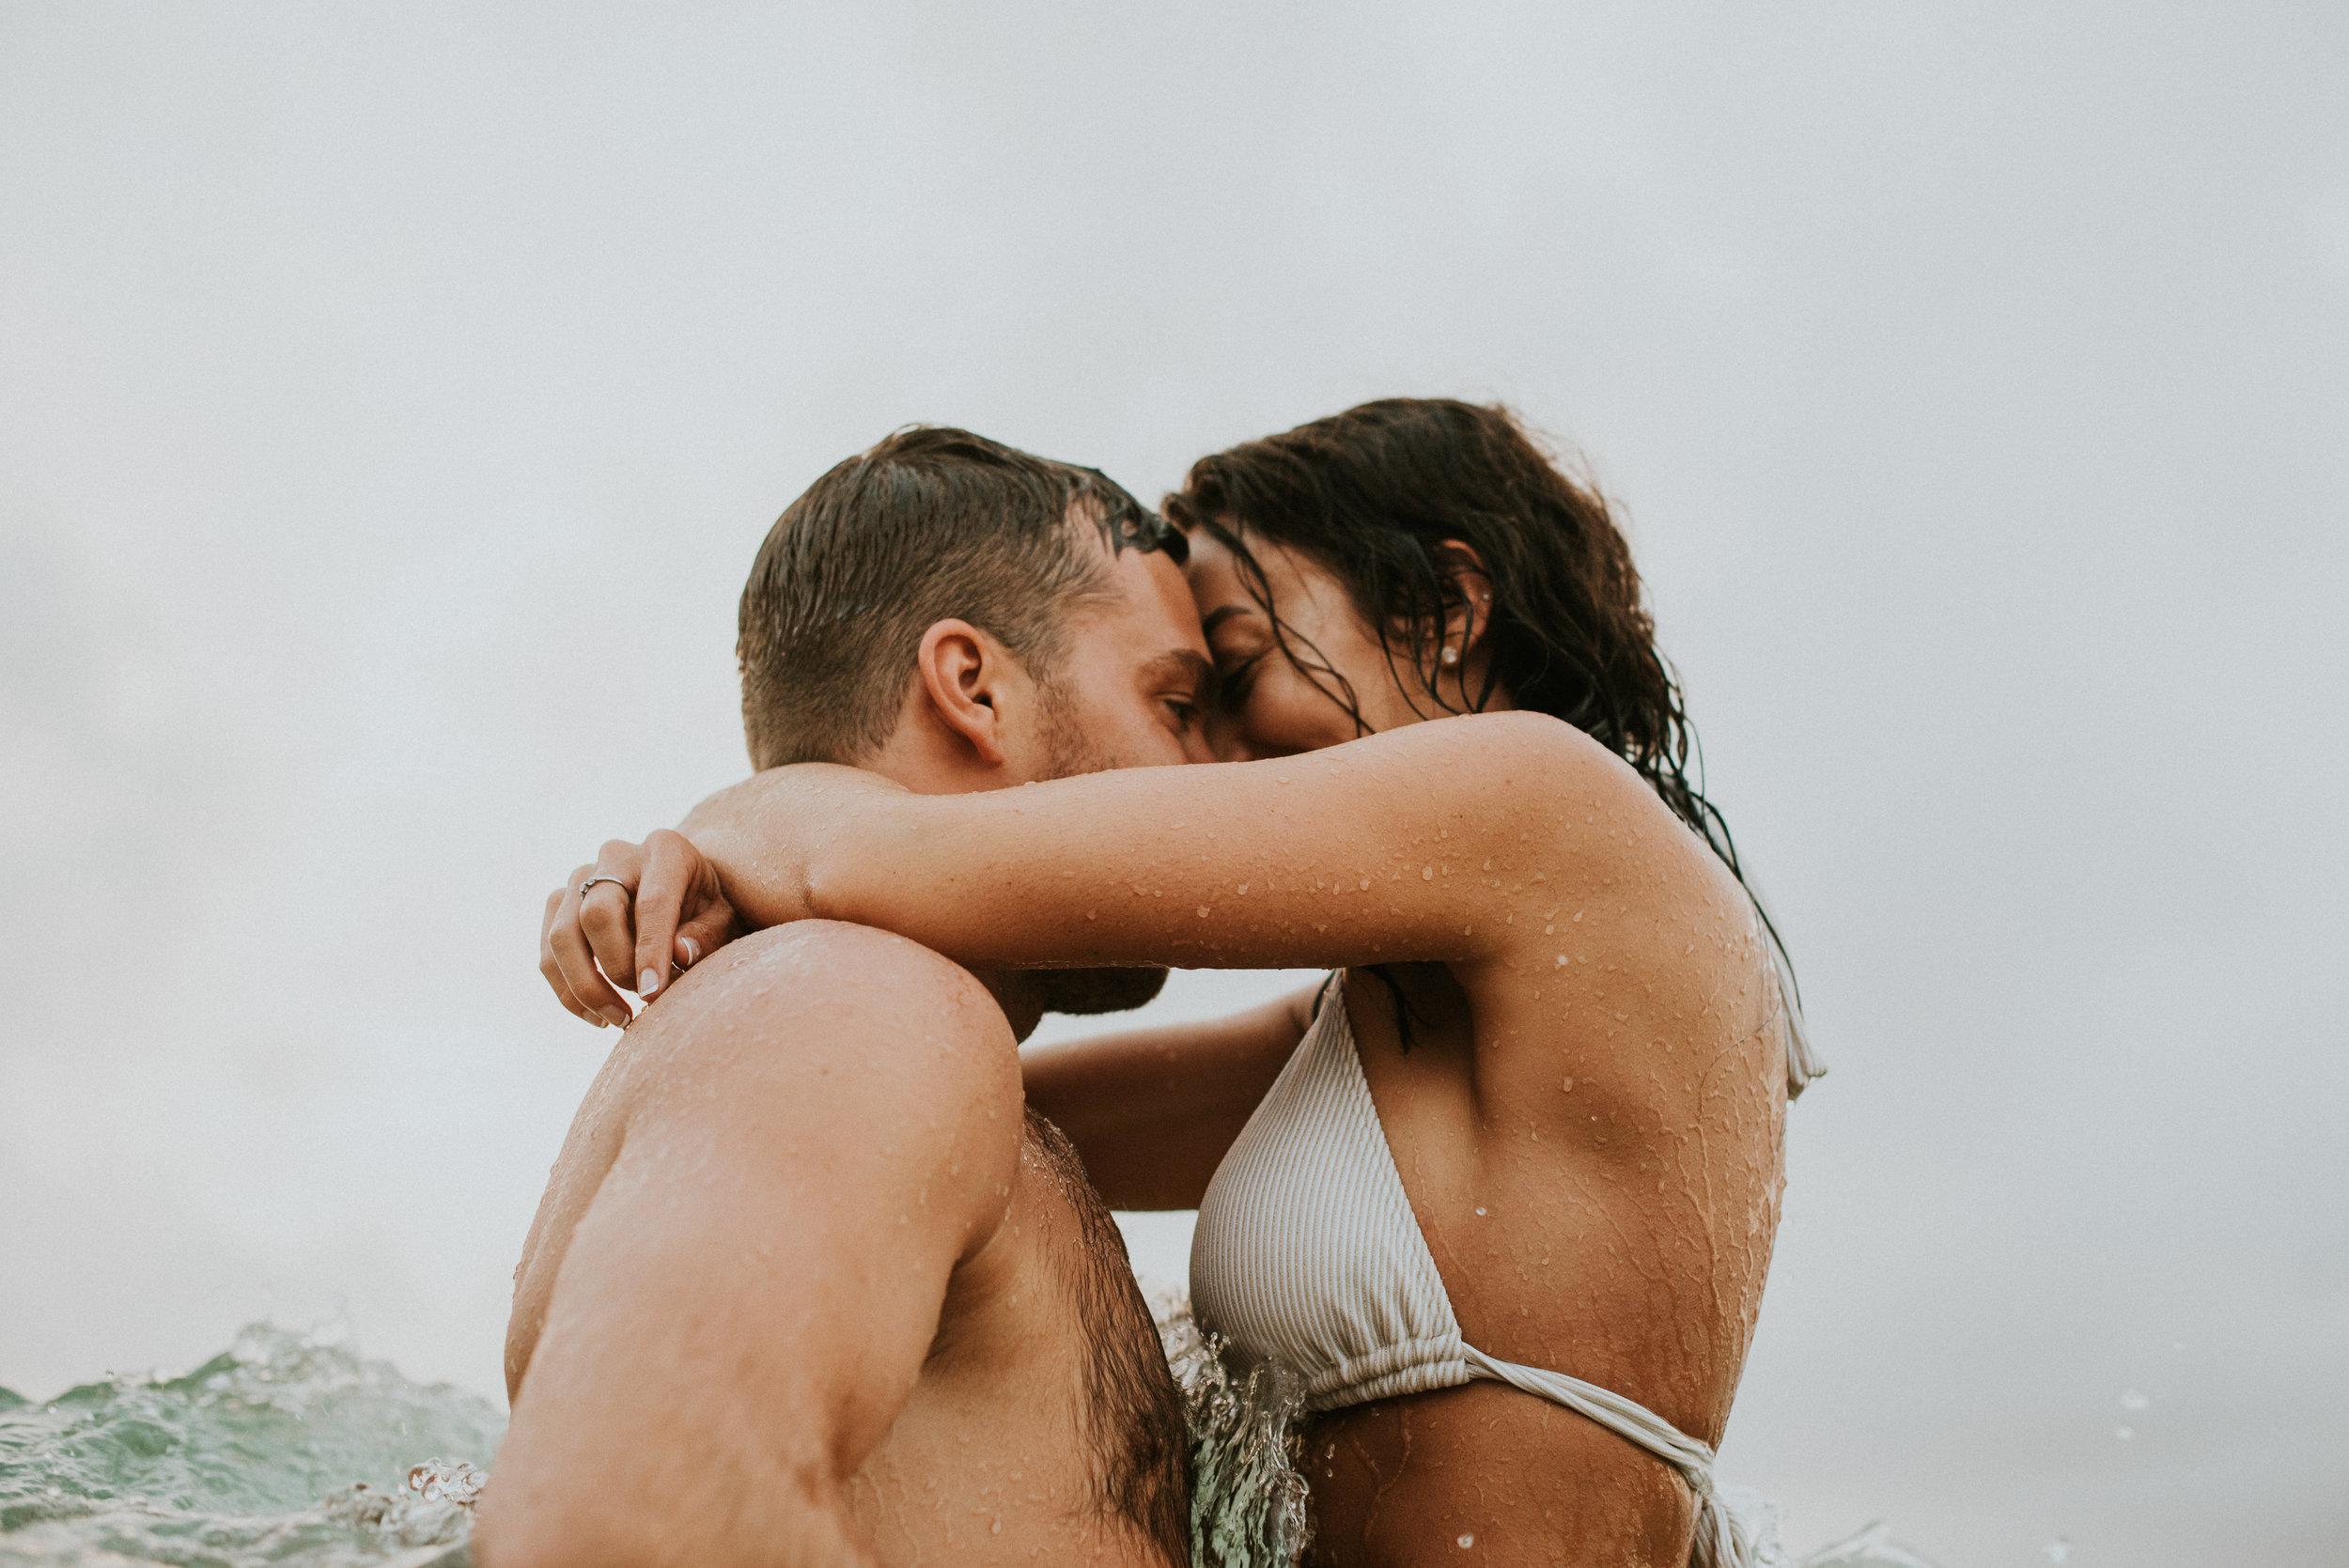 Amanda + Sean Wedding - Majestic Elegance, Punta Cana, Dominican Republic - Kamra Fuller Photography - Seattle Wedding Photographer - Seattle Elopement Photographer - Destination Wedding Photographer